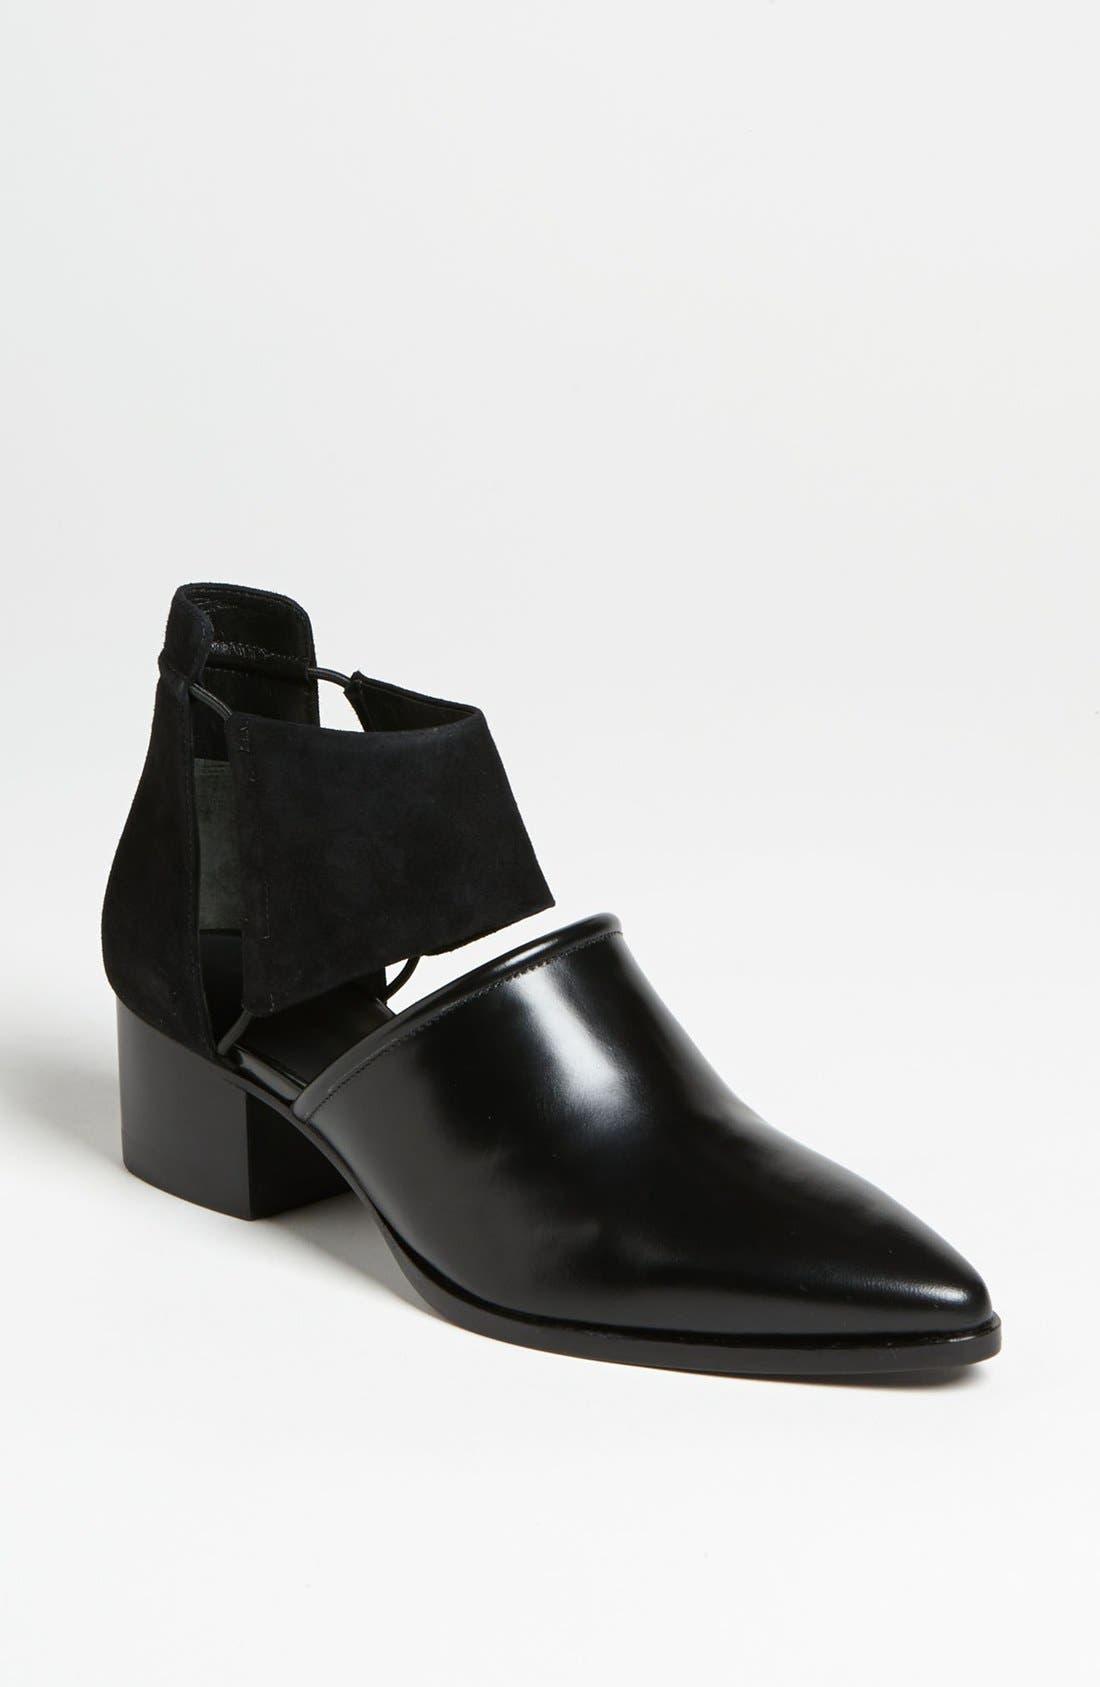 Main Image - Alexander Wang 'Nadine' Ankle Boot